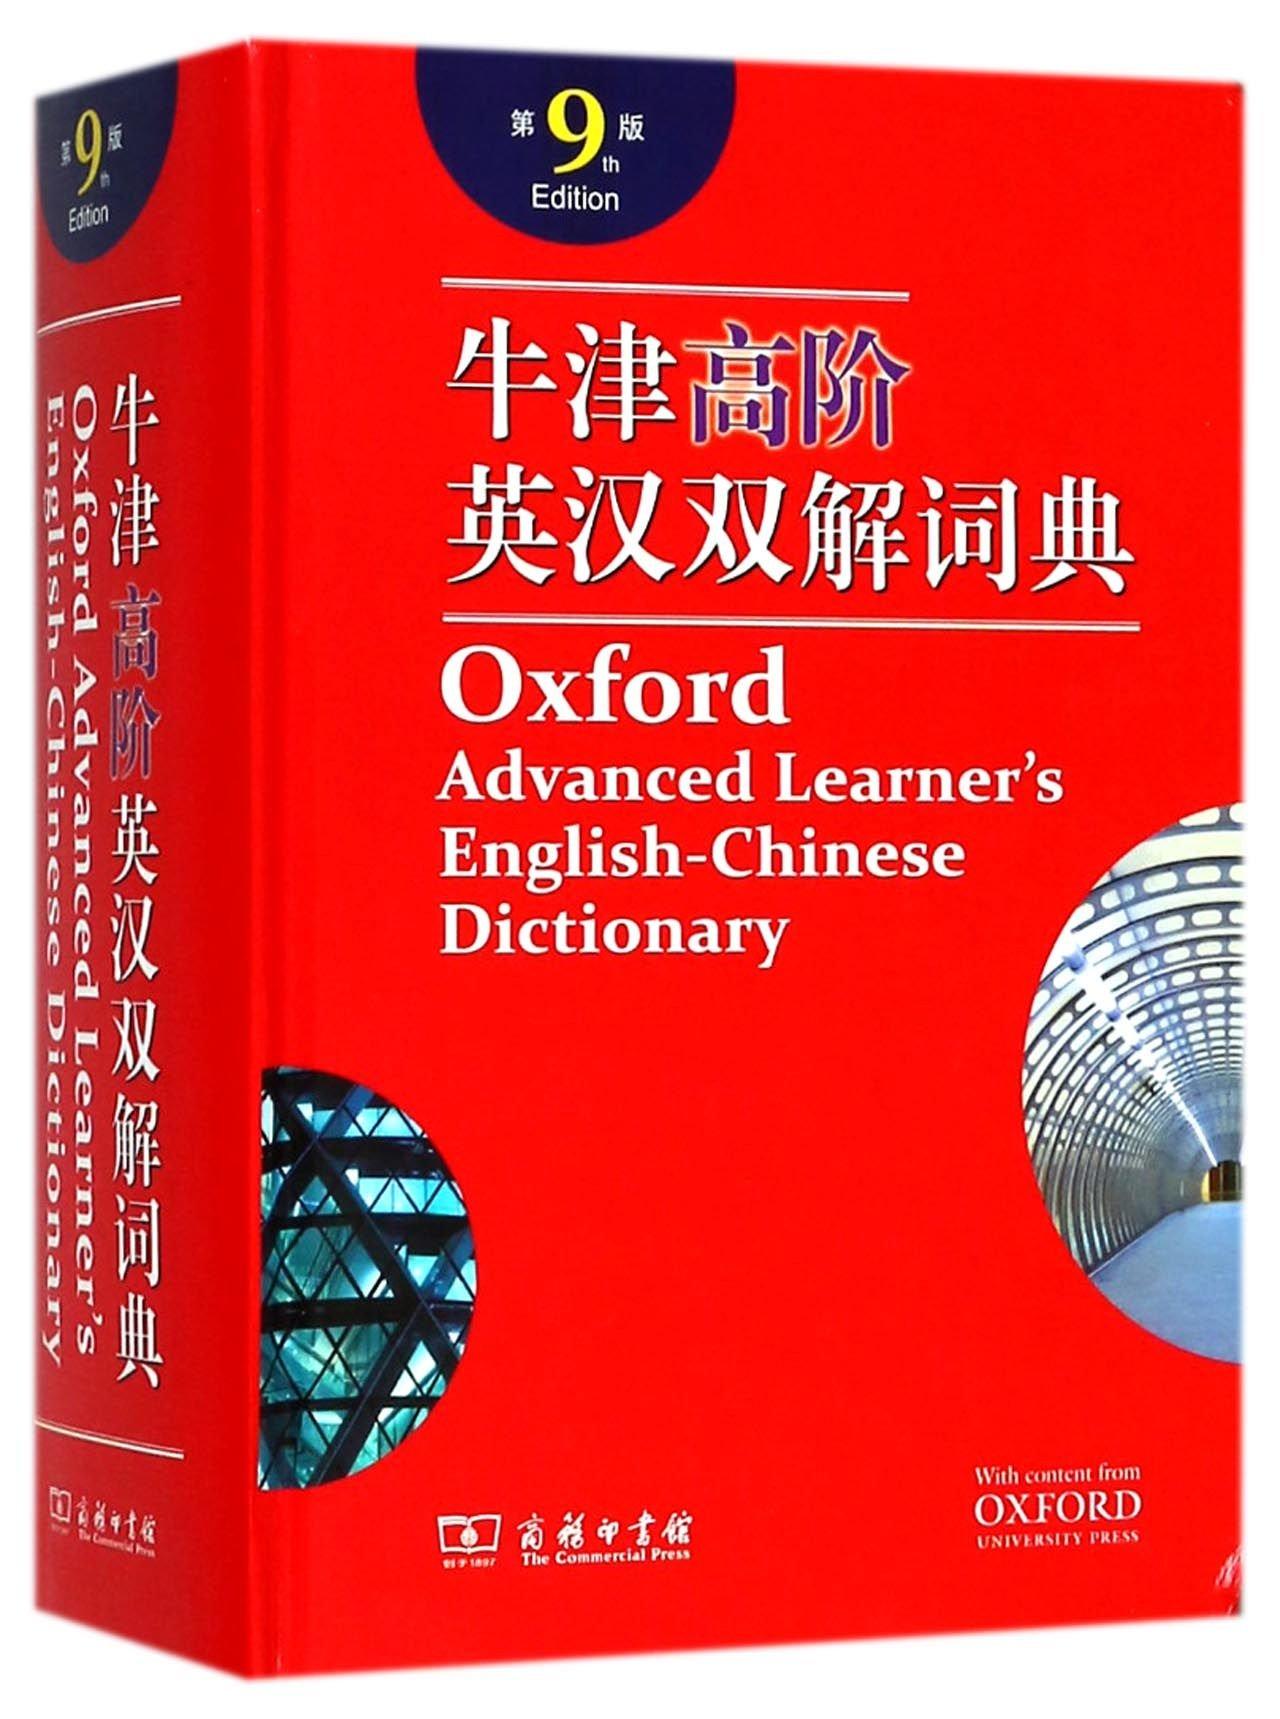 Diccionario Inglés-chino de Oxford advanced, edición 9